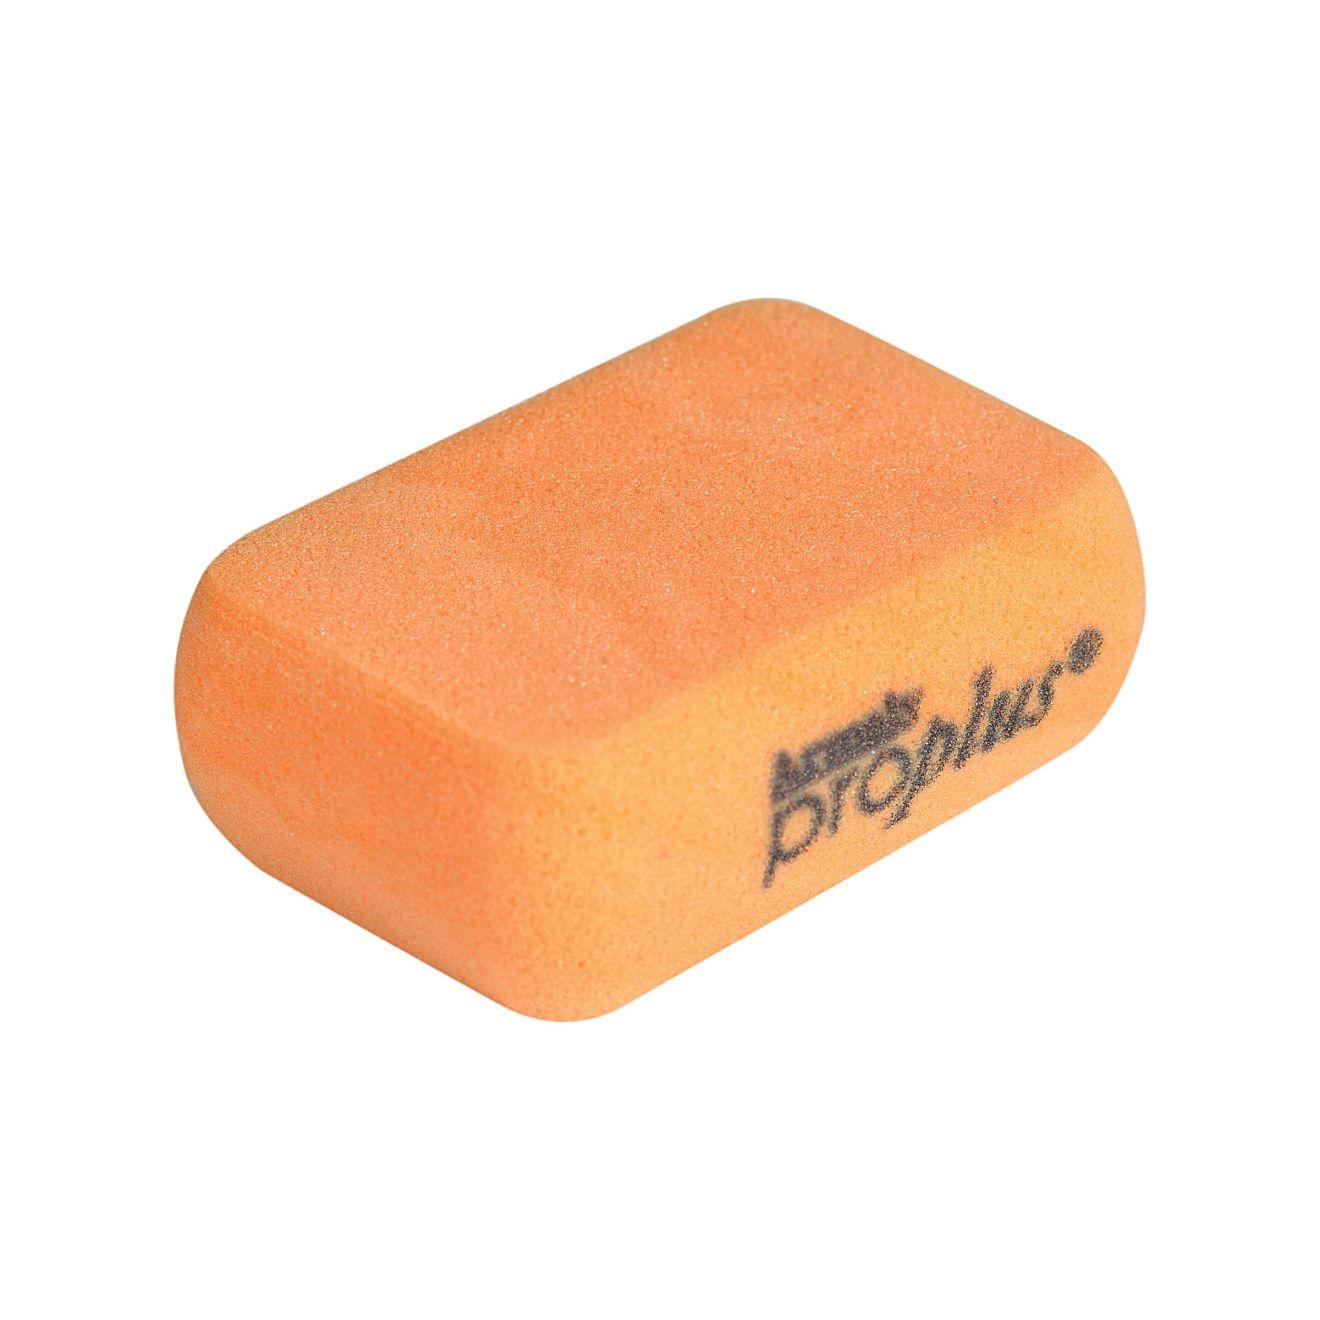 Armaly ProPlus Latex Caulking & Un-Sanded Grouting Sponge